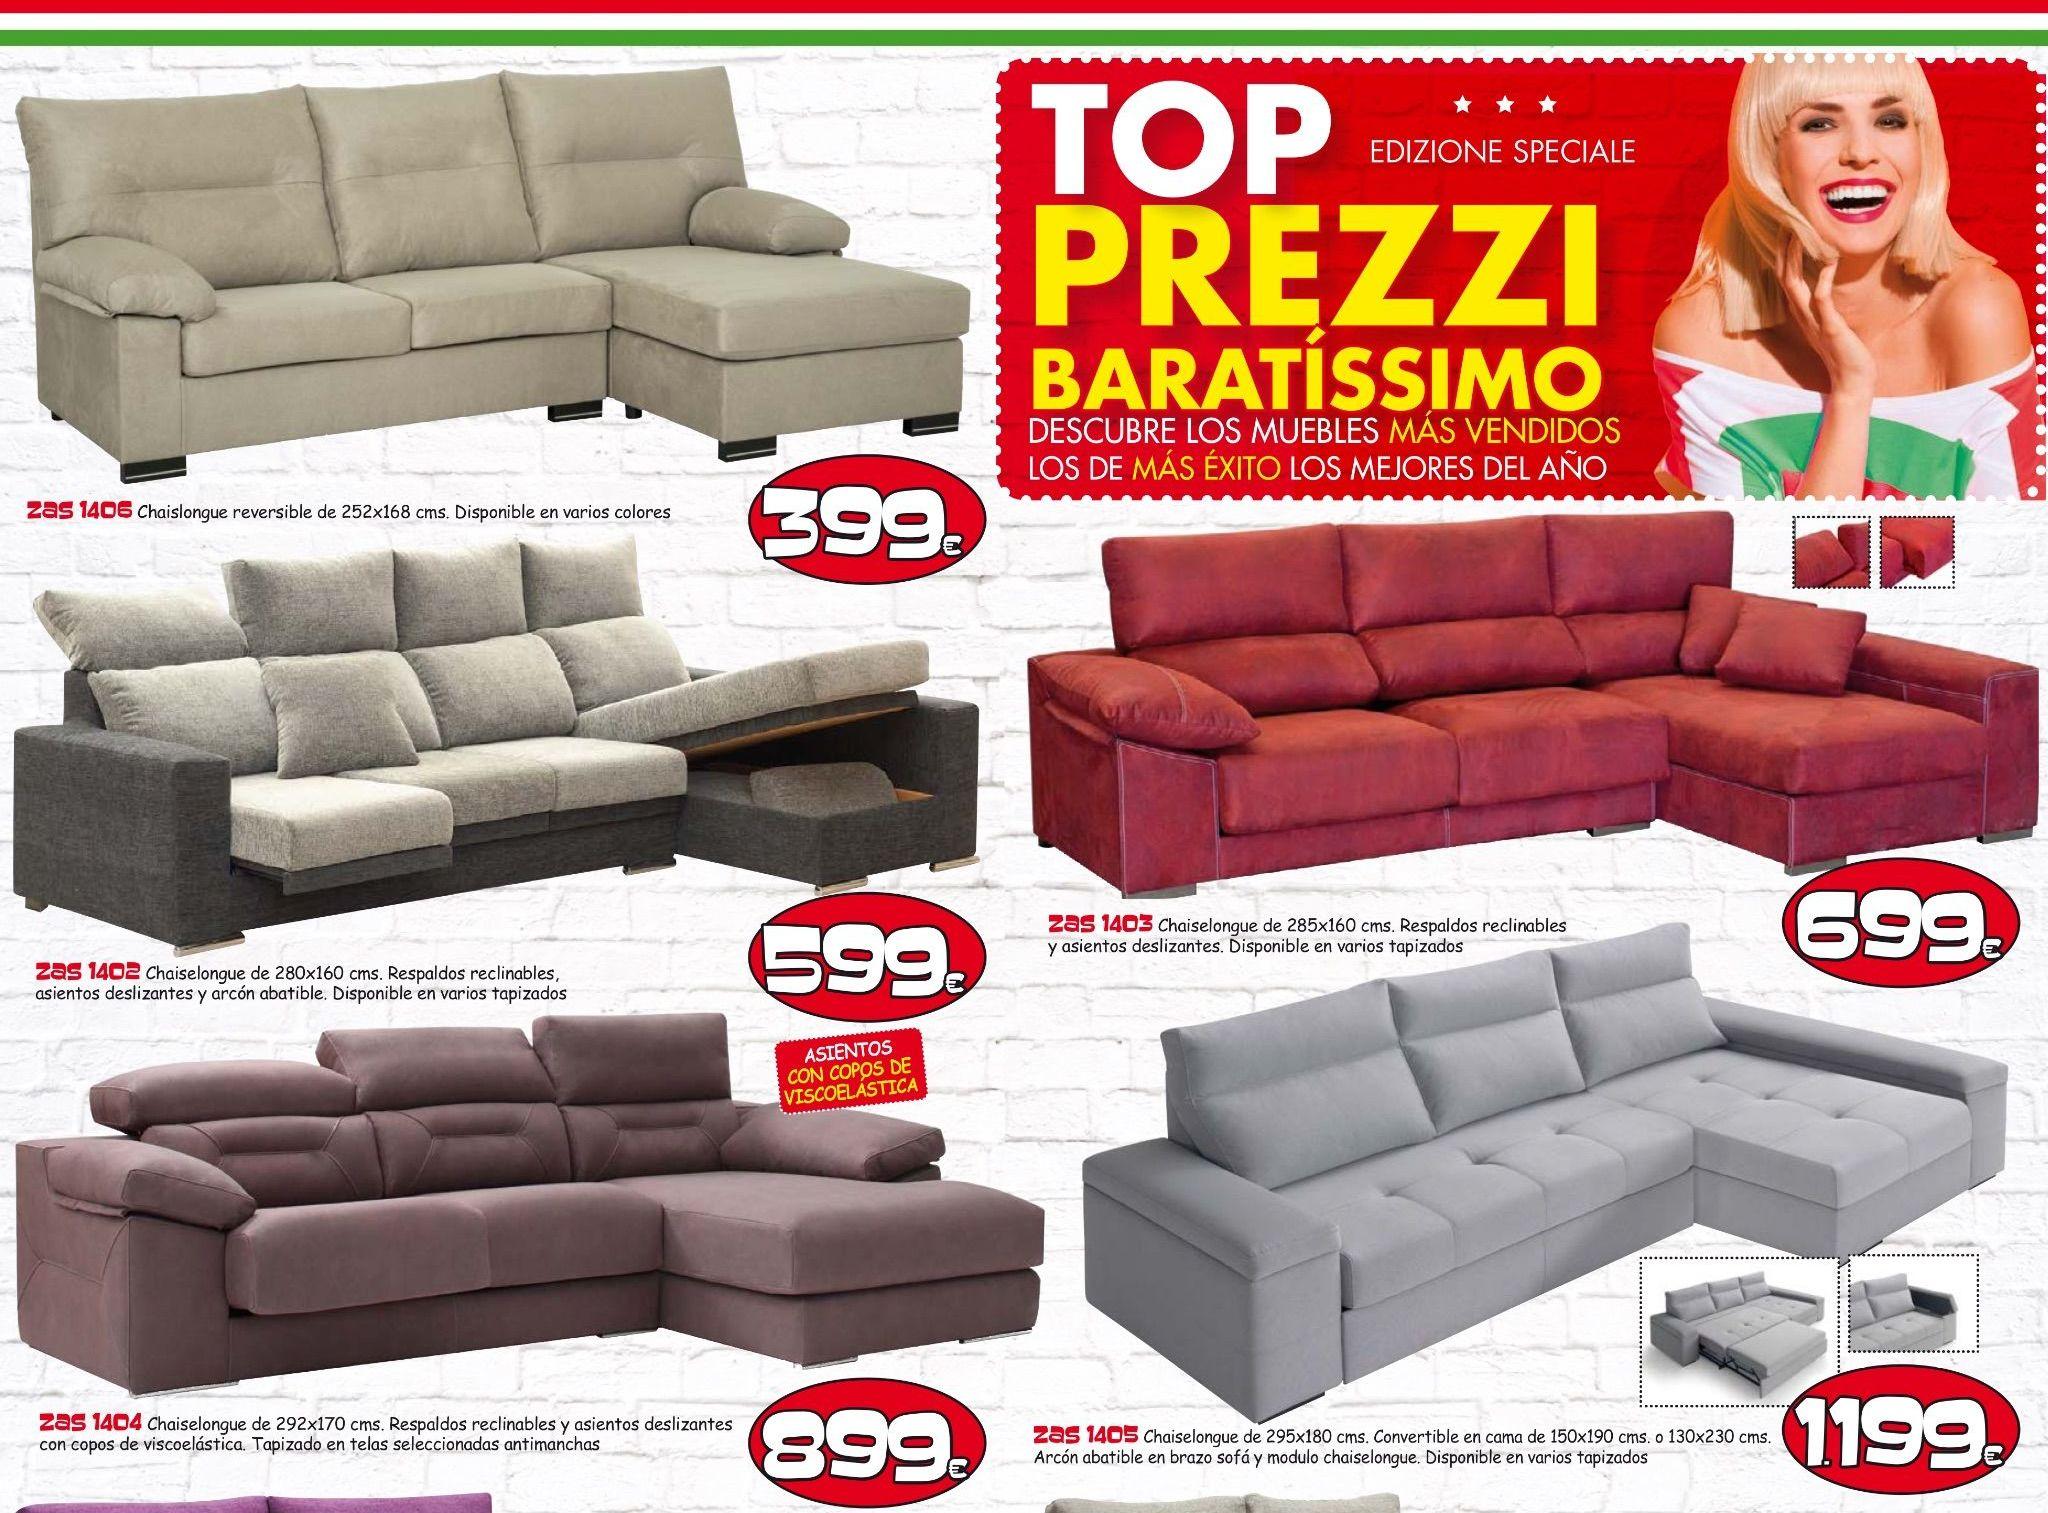 sofa usados baratos stressless manhattan 2 seater muebles super con forro oferta del ao